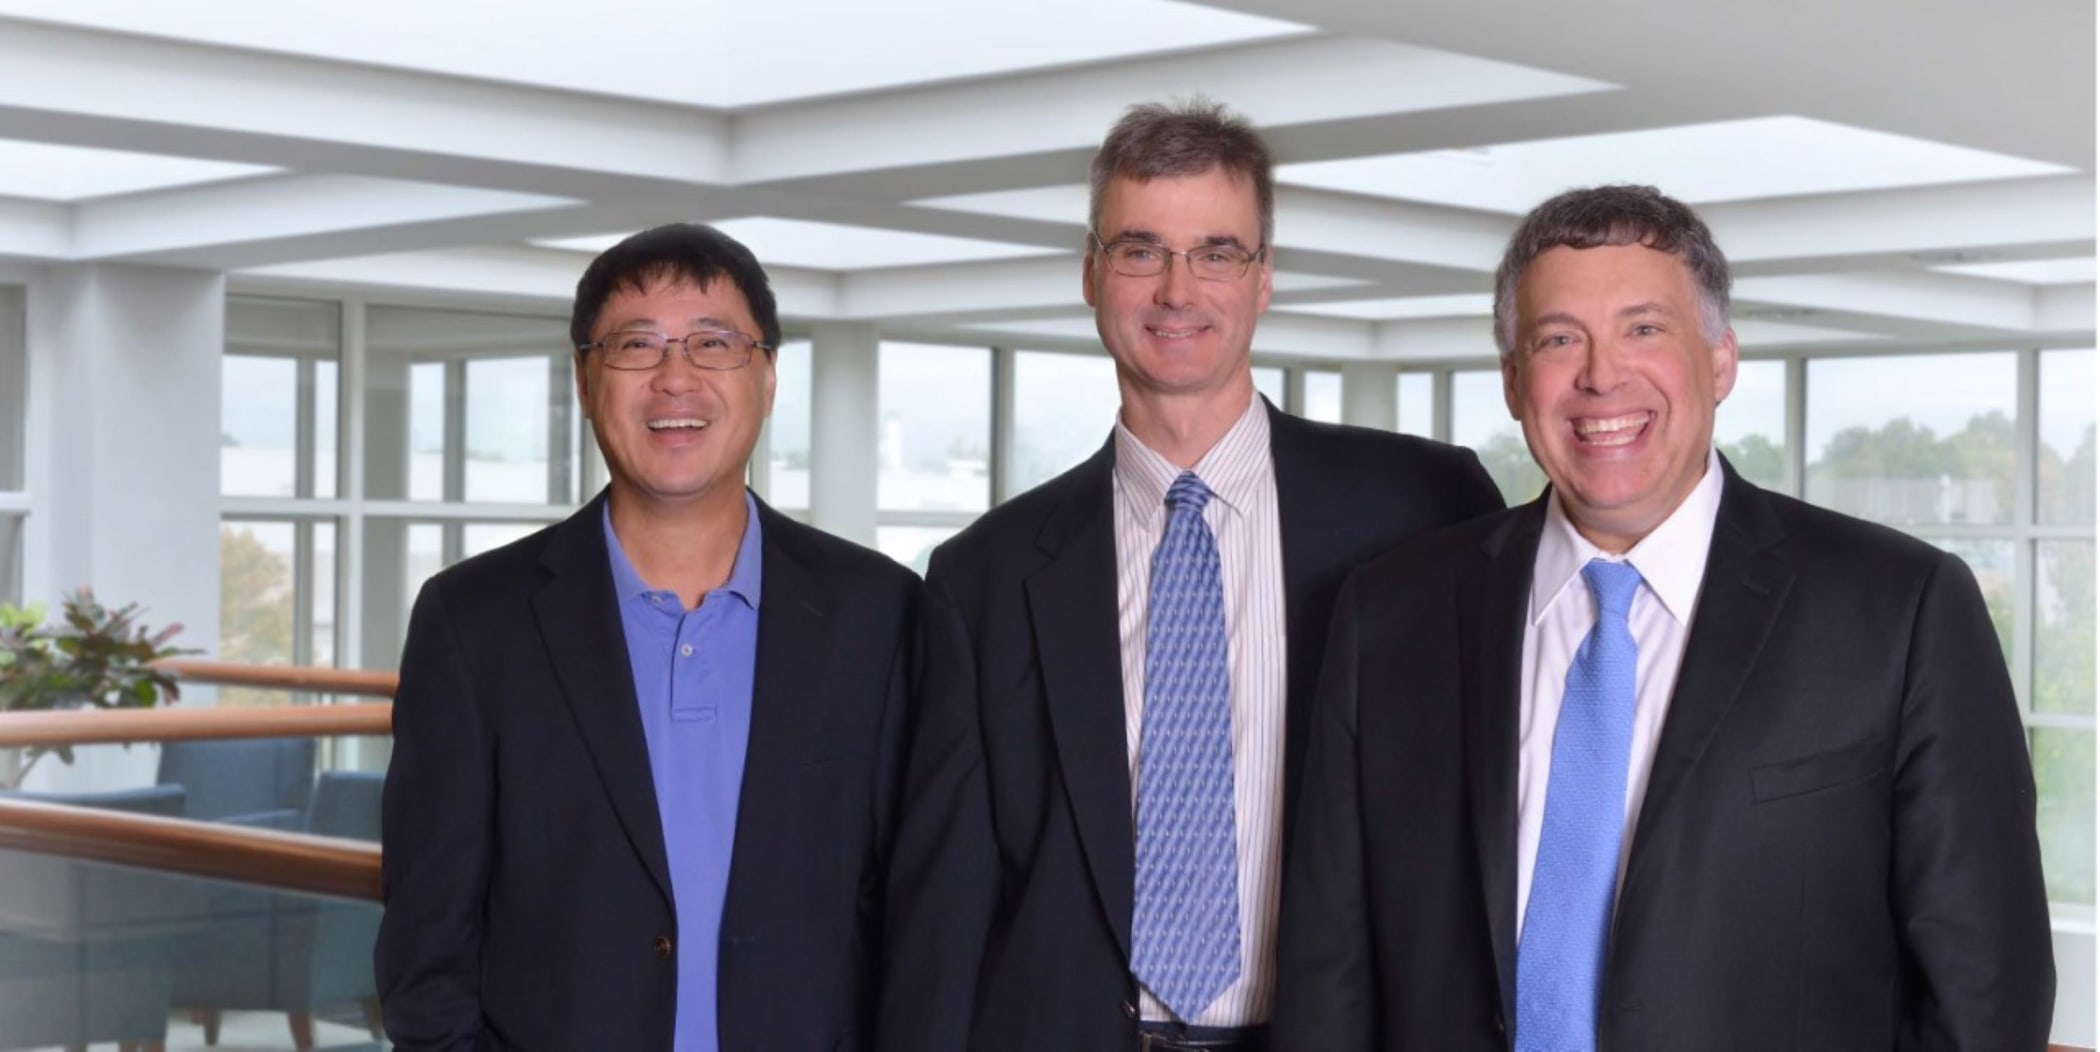 Lieping Chen, MD, PhD, Edward Kaftan, PhD, and Roy S. Herbst, MD, PhD